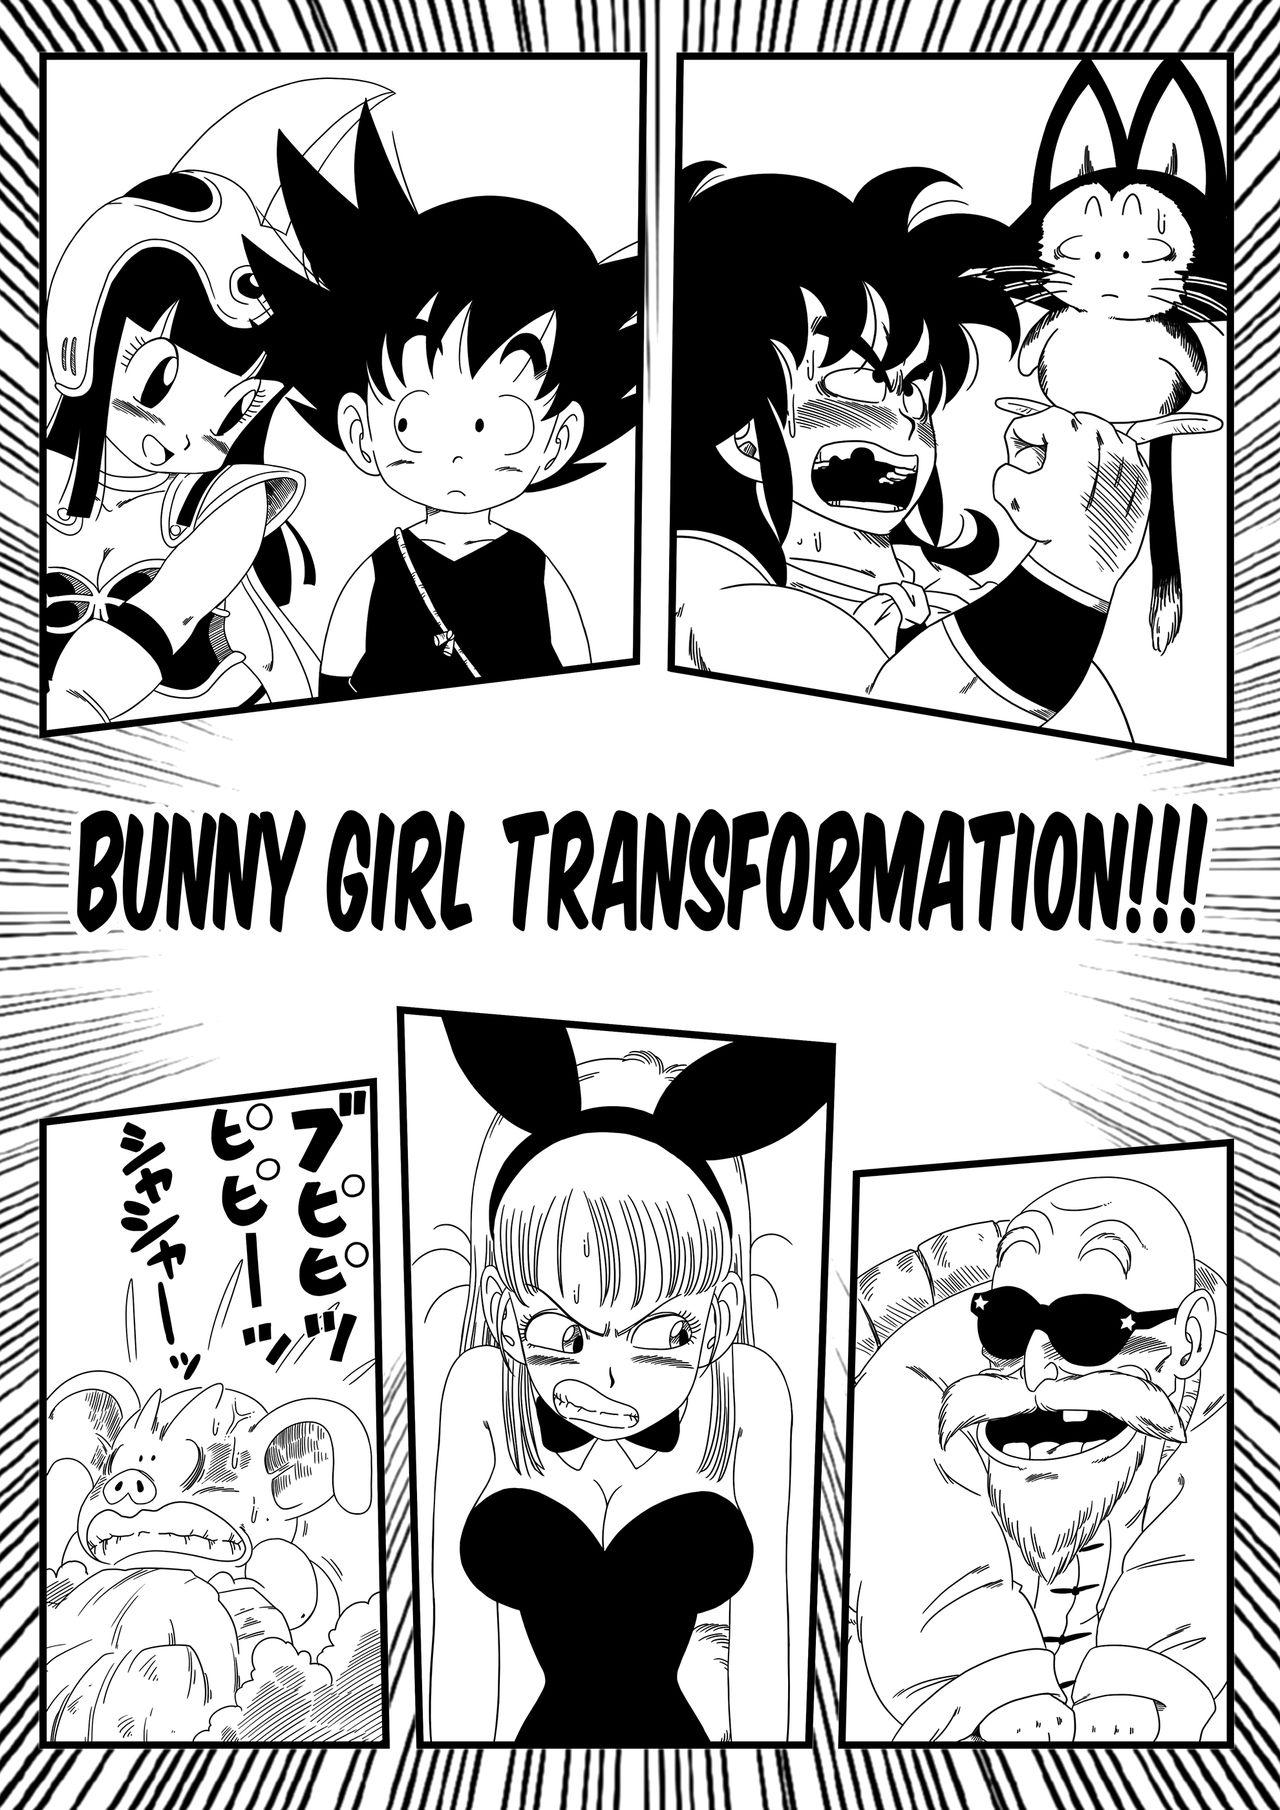 Bunny Girl Transformation 2